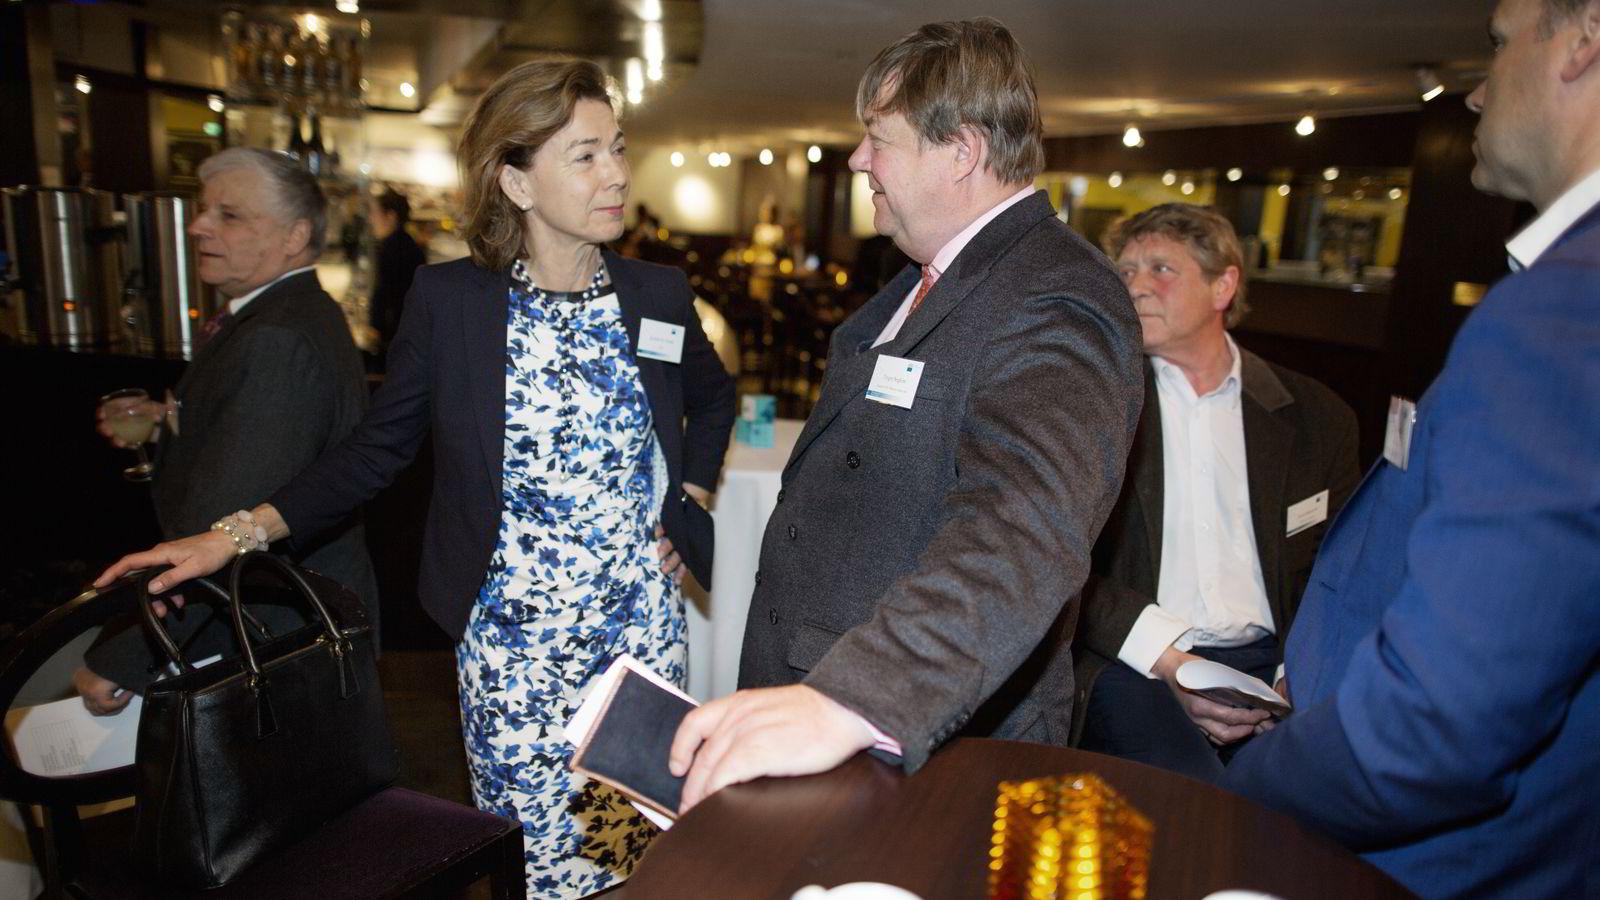 DNBs shippingbanksjef Kristin H. Holth               sammen med sjefen for Knutsen OAS Shipping Trygve Seglem under Rederiforbundets årskonferanse i Folketeateret. Foto: